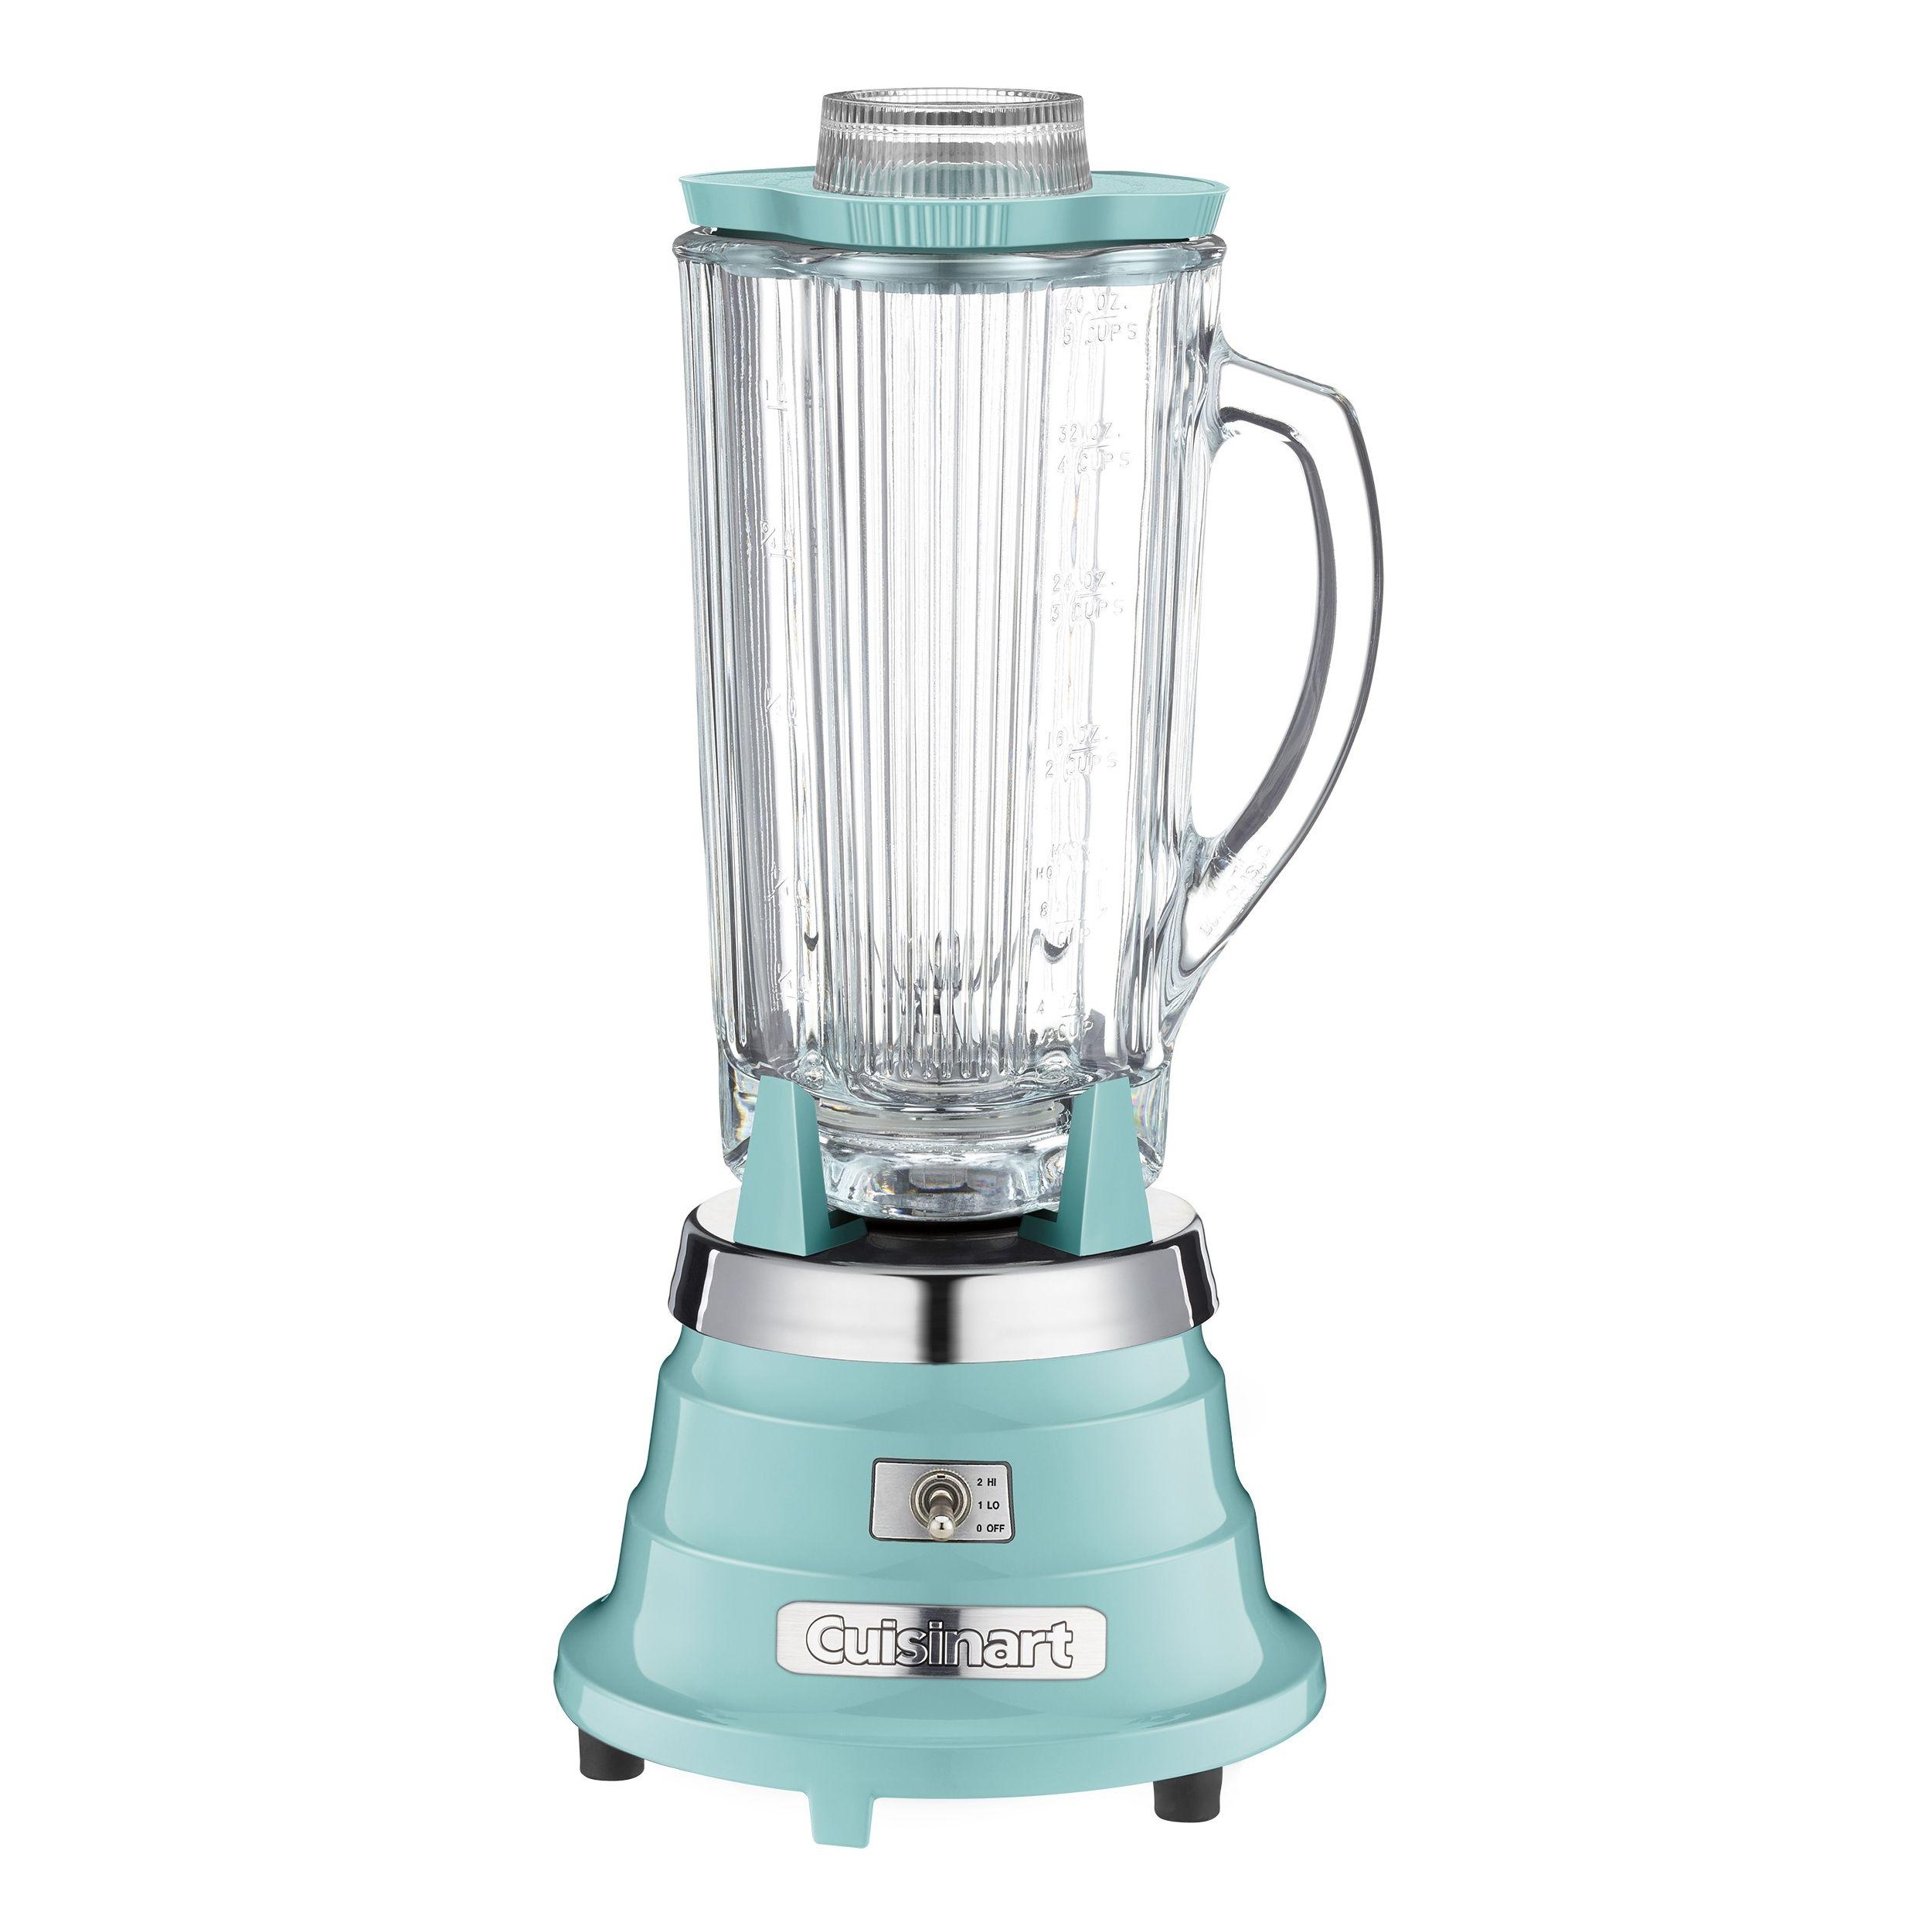 31 Best Retro Kitchen Appliances for 2018 - Vintage-Inspired ...